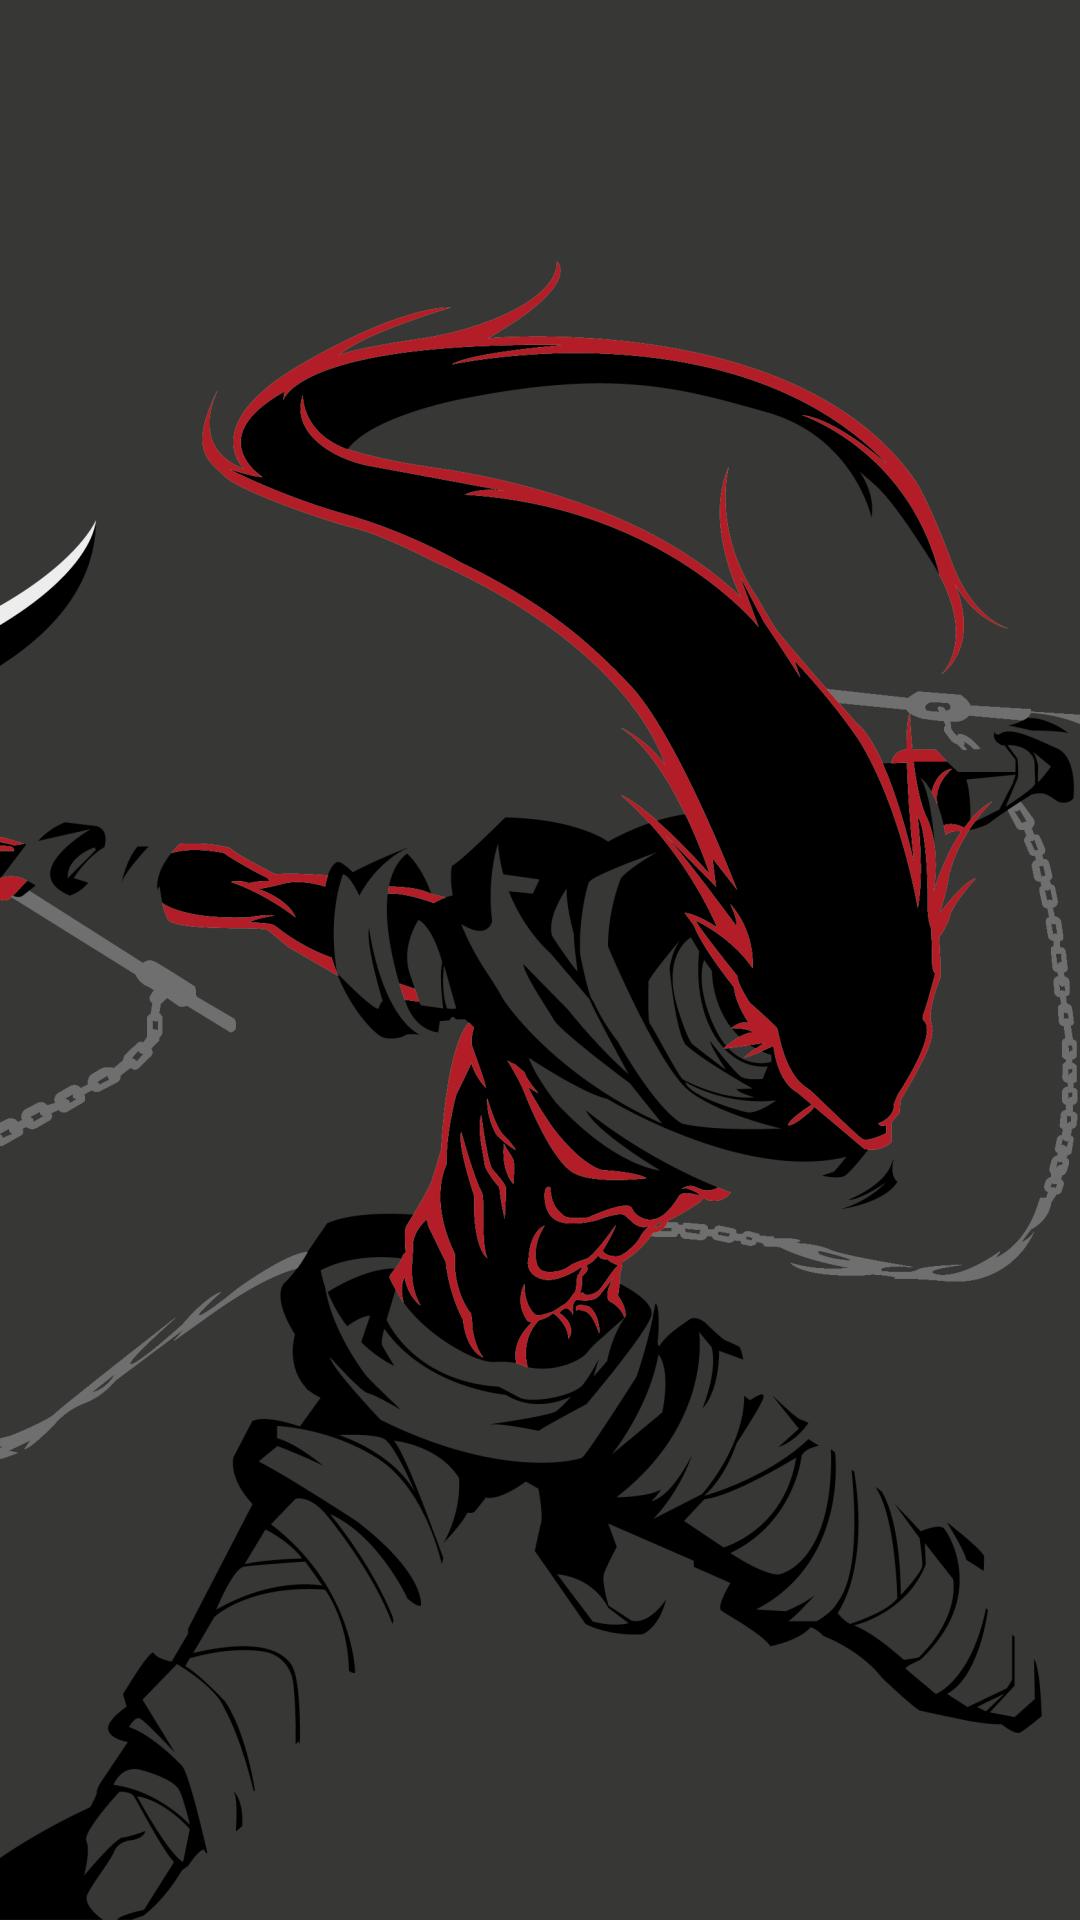 Download Wallpaper Anime / Bleach (1080x1920) Mobile Wallpaper